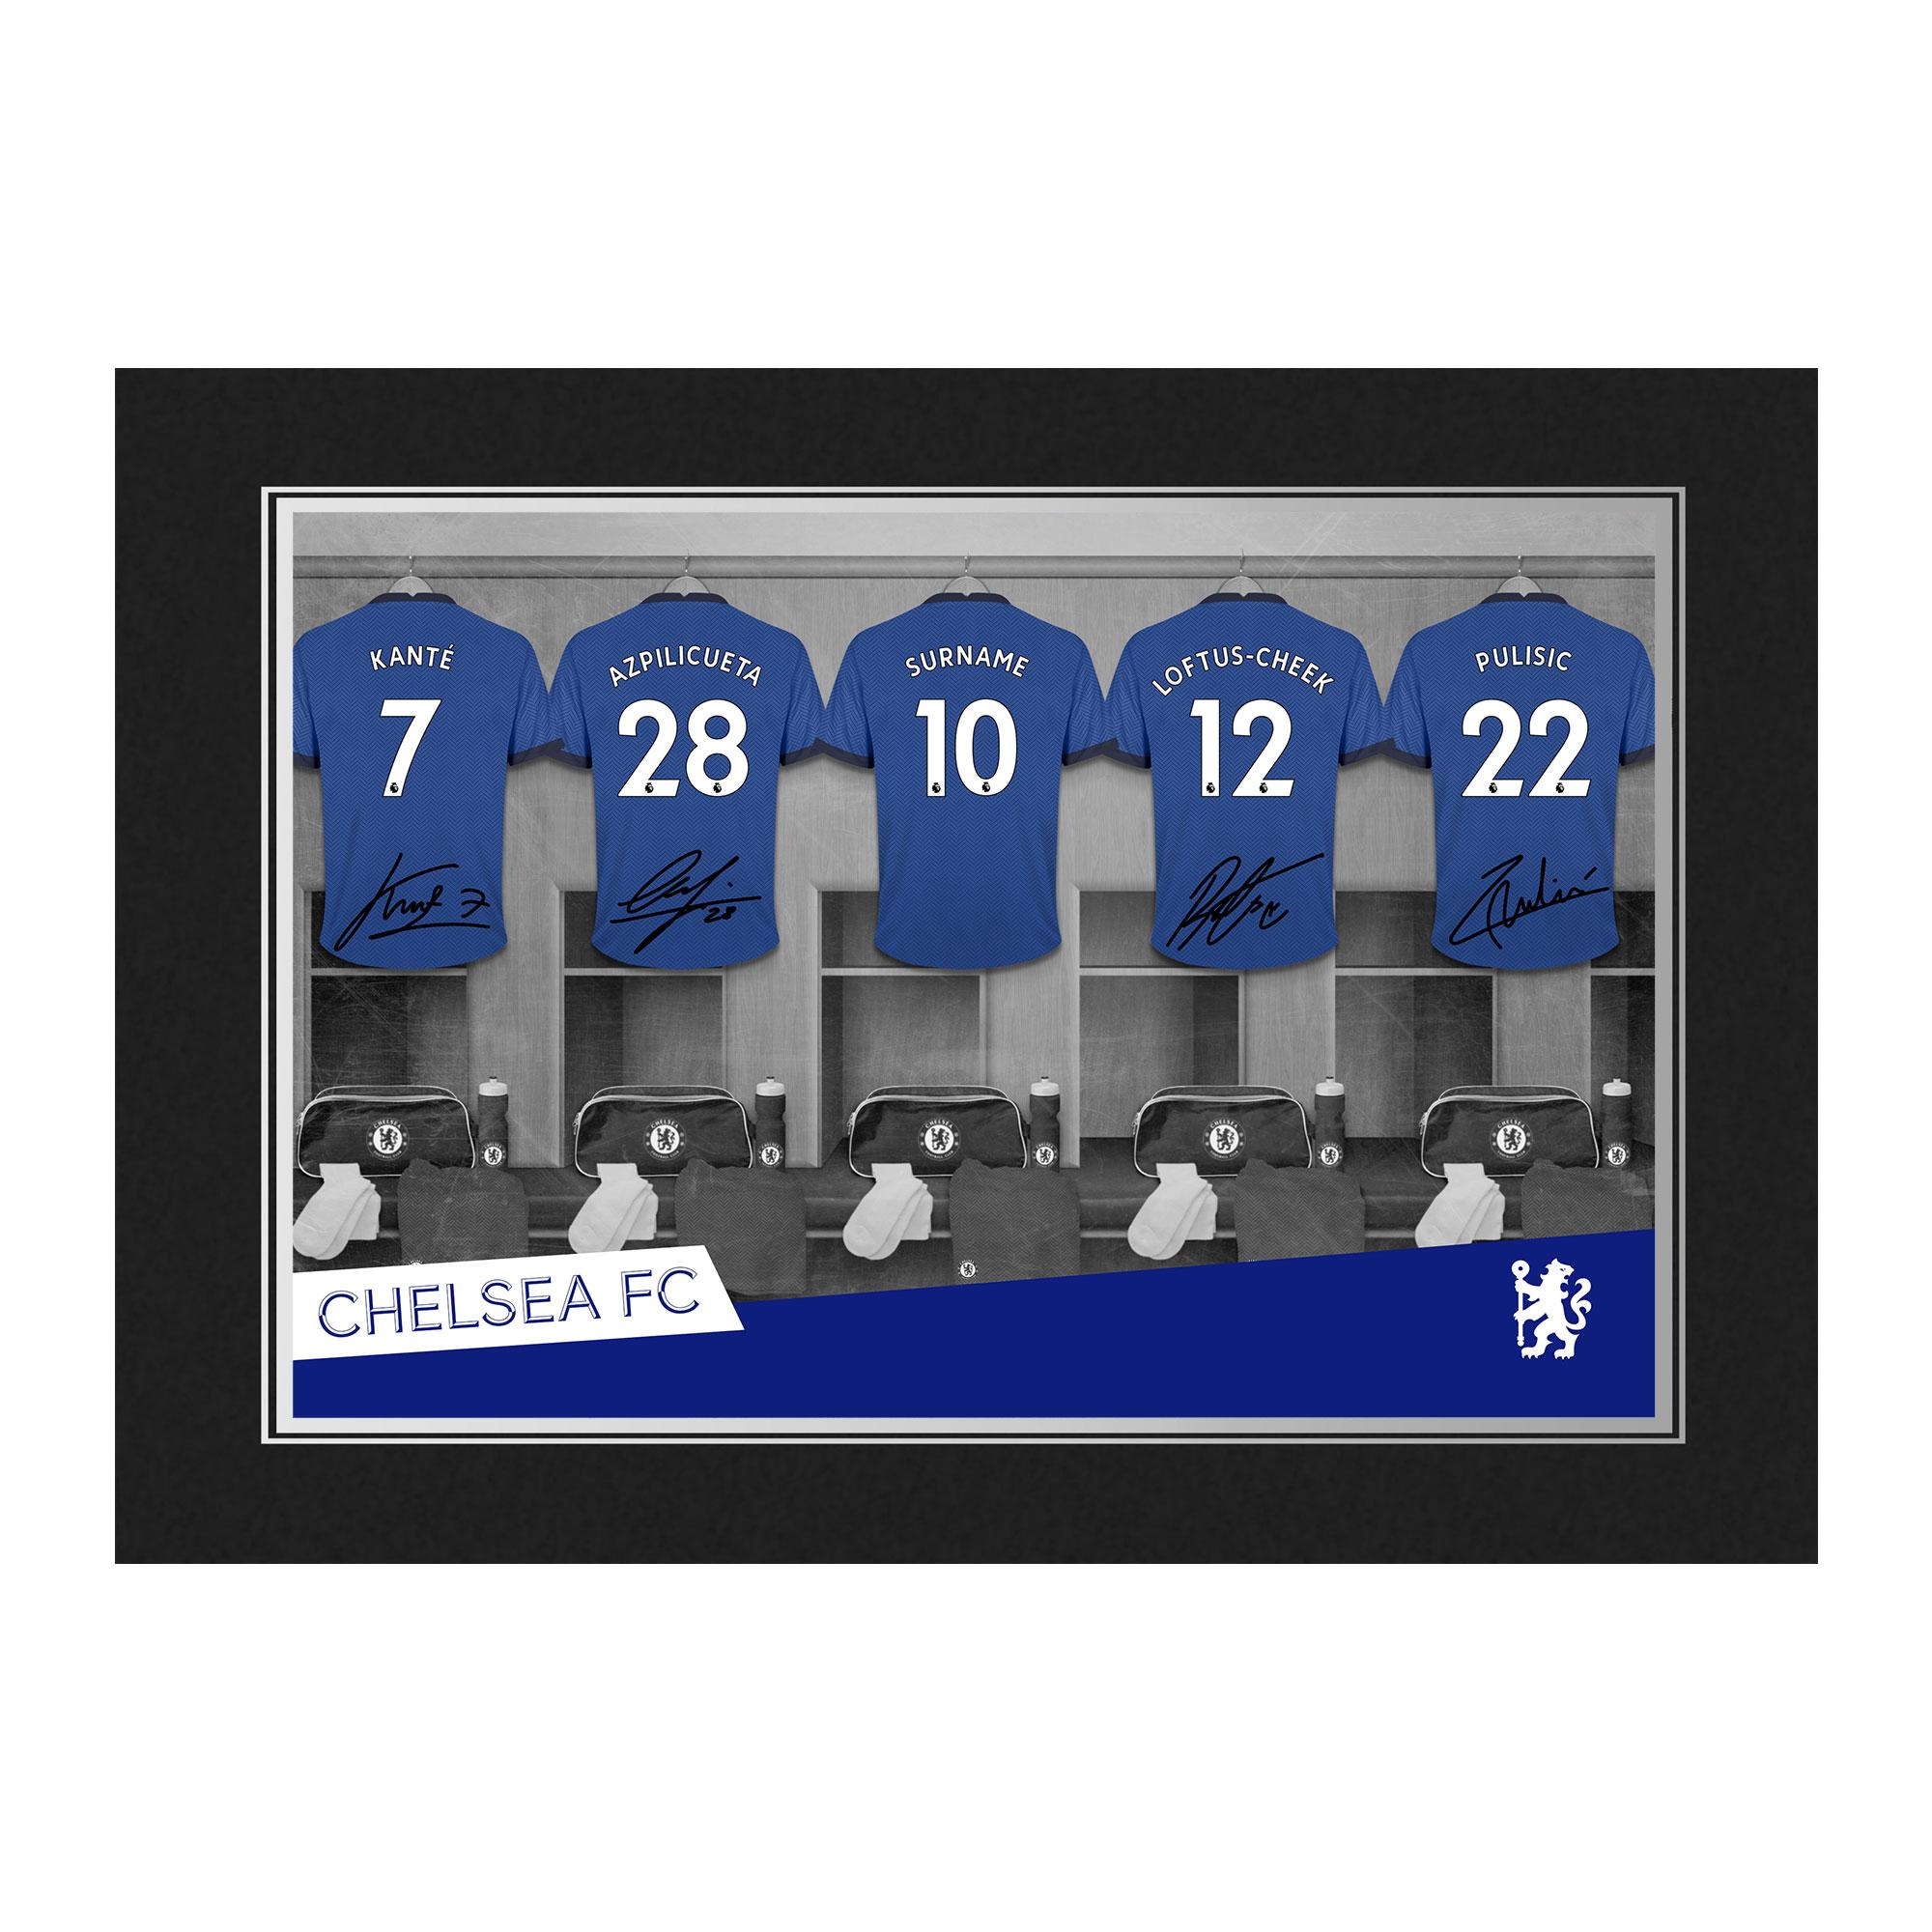 Chelsea FC 9x6 Dressing Room Photo Folder